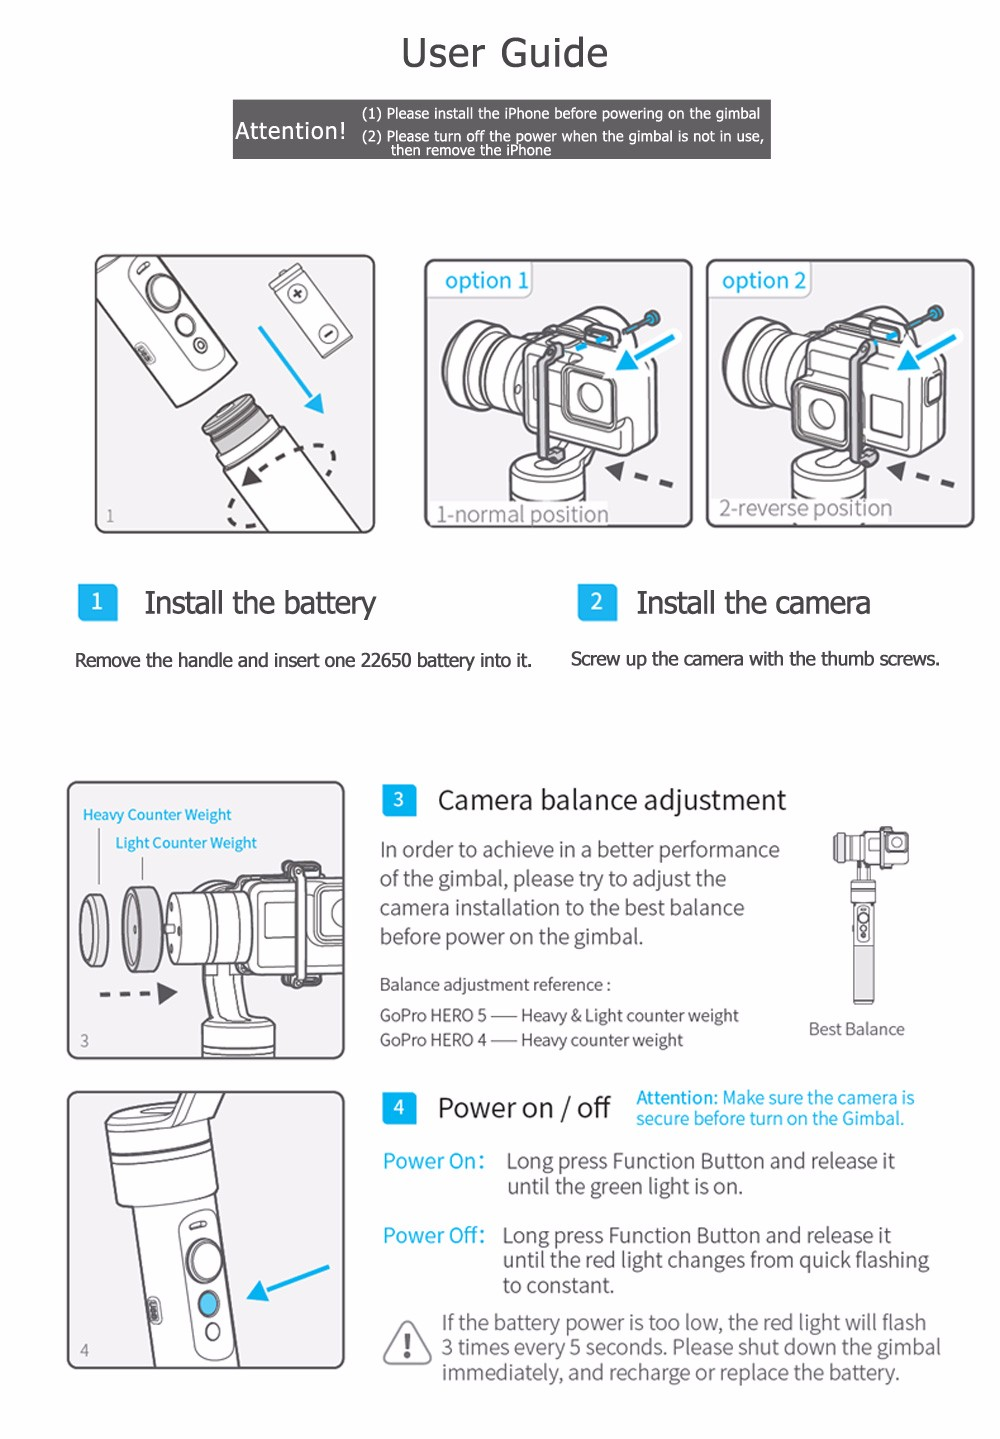 FeiyuTech Feiyu G5 Splash Proof waterproof 3-Axis Handheld Action Camera Gimbal For GoPro HERO 6 5 4 3 3+ Xiaomi yi 4k SJ AEE 18